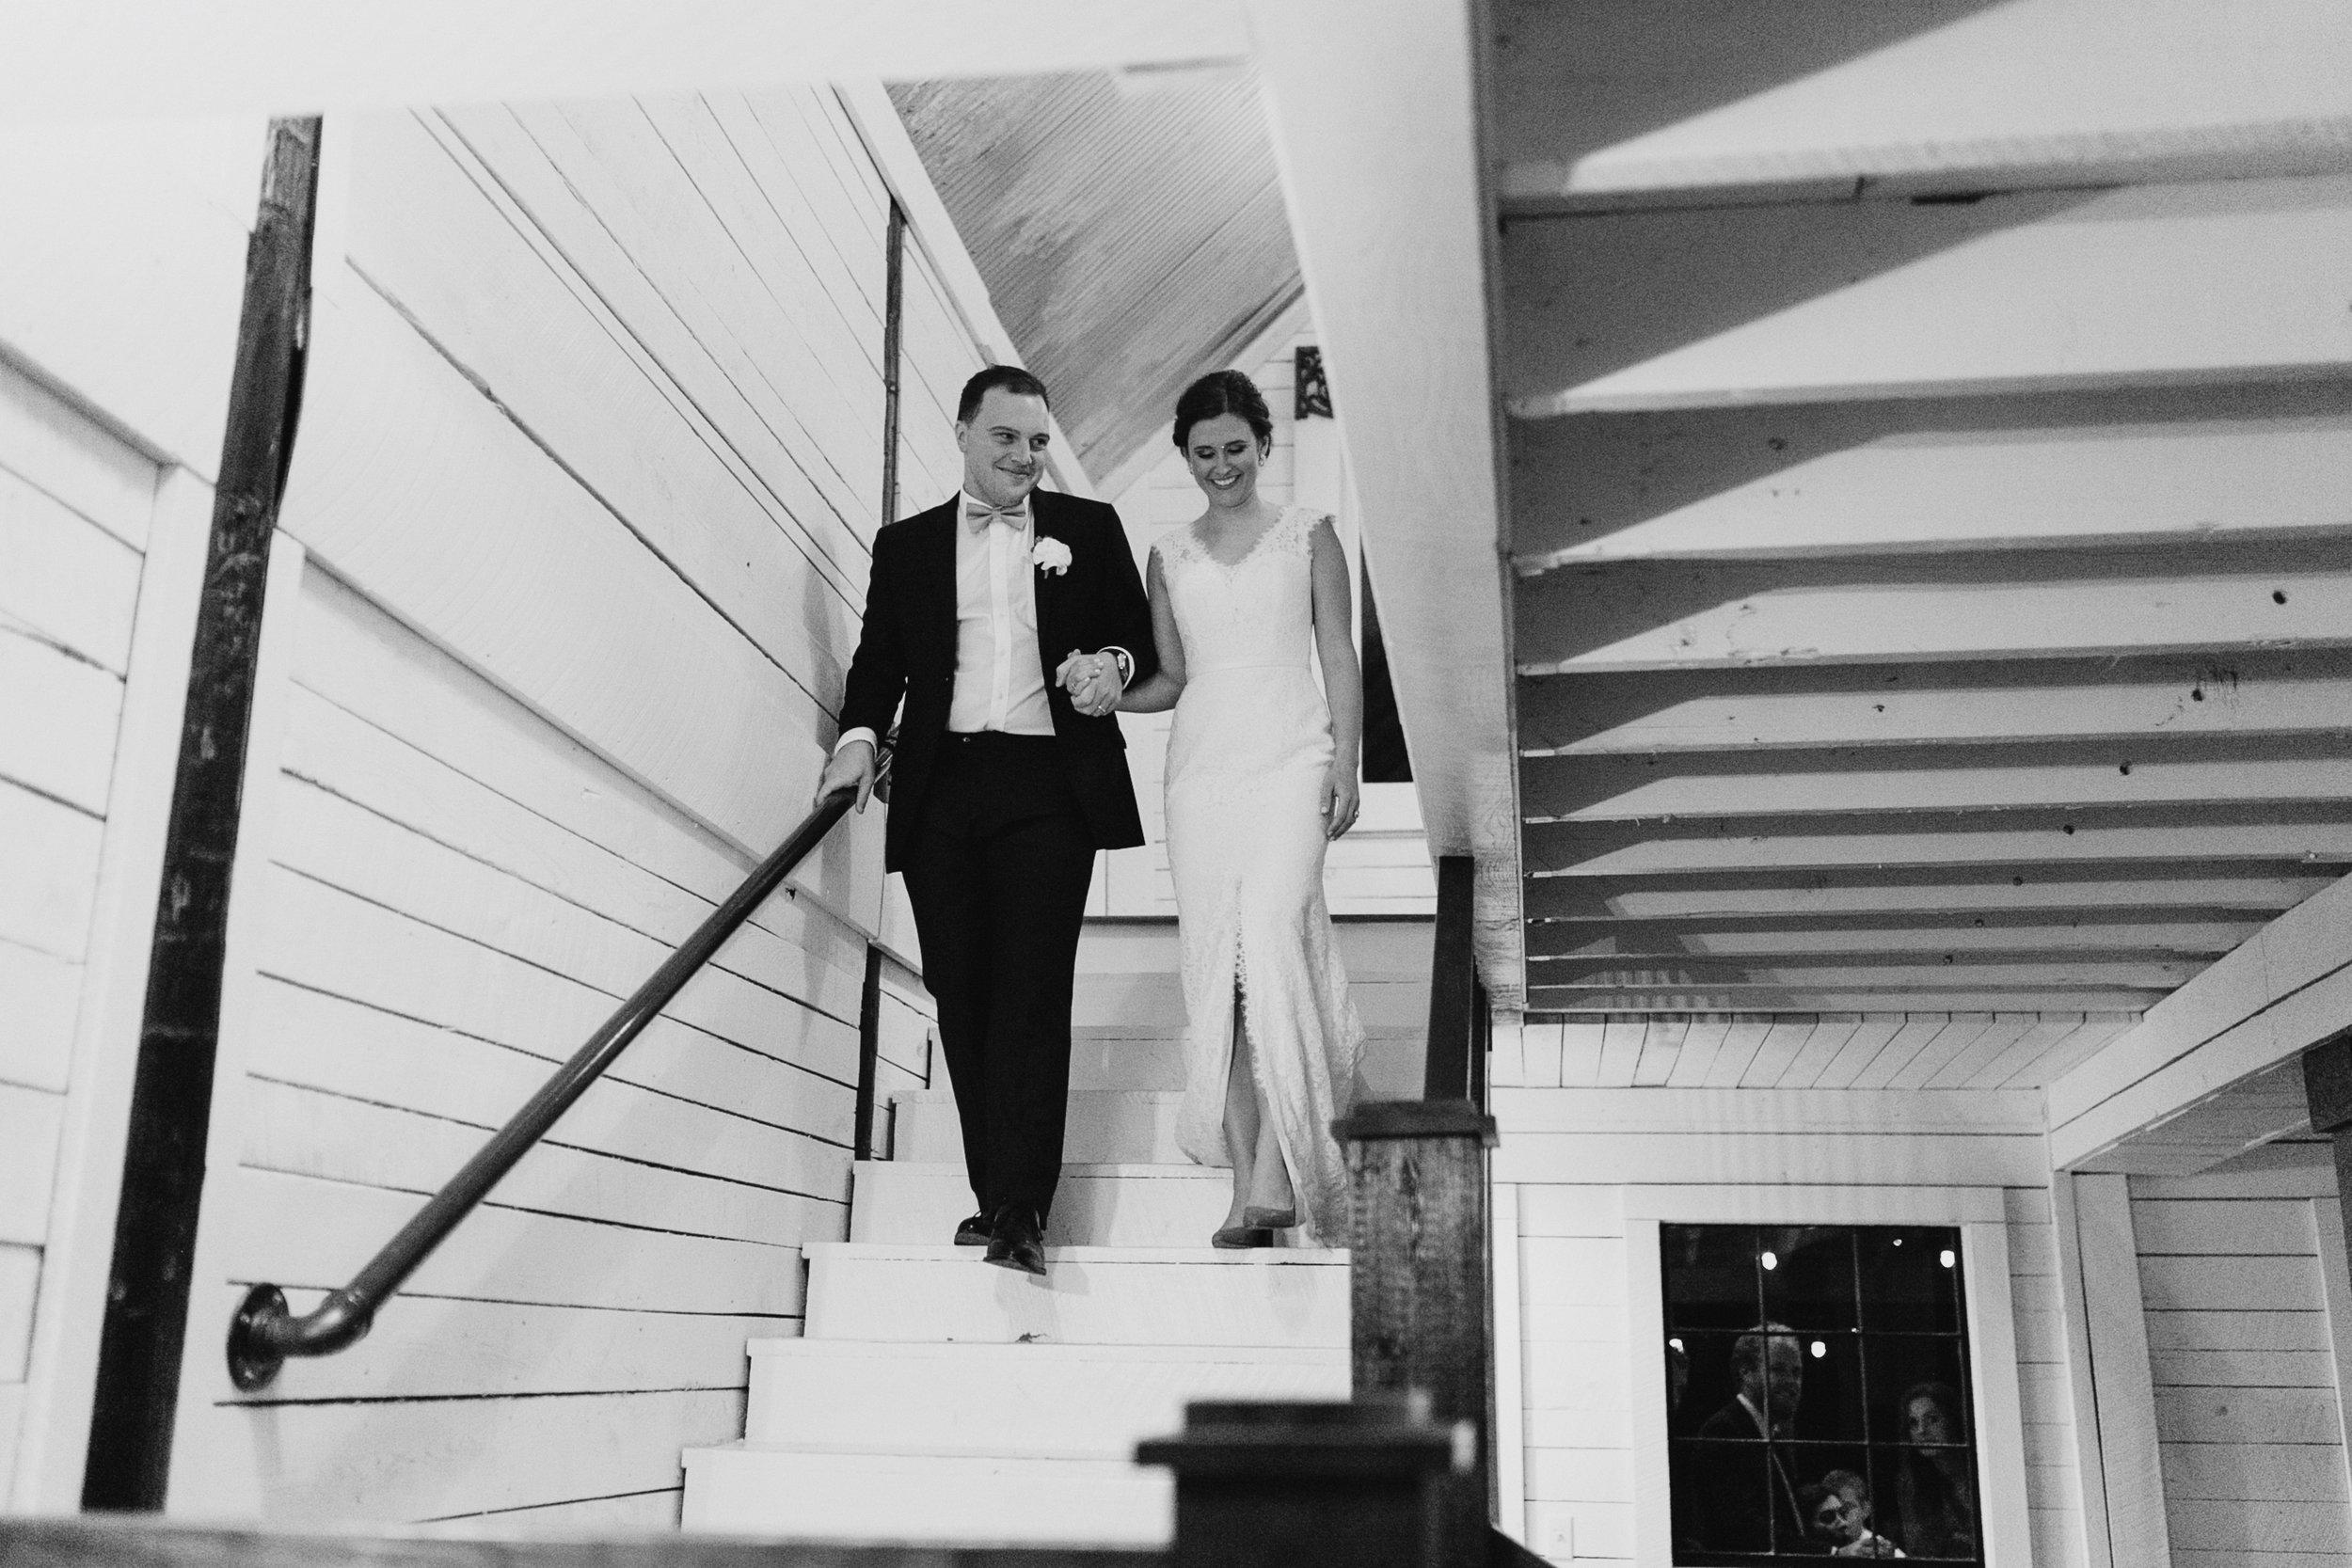 woltemath-wedding-535a.jpg